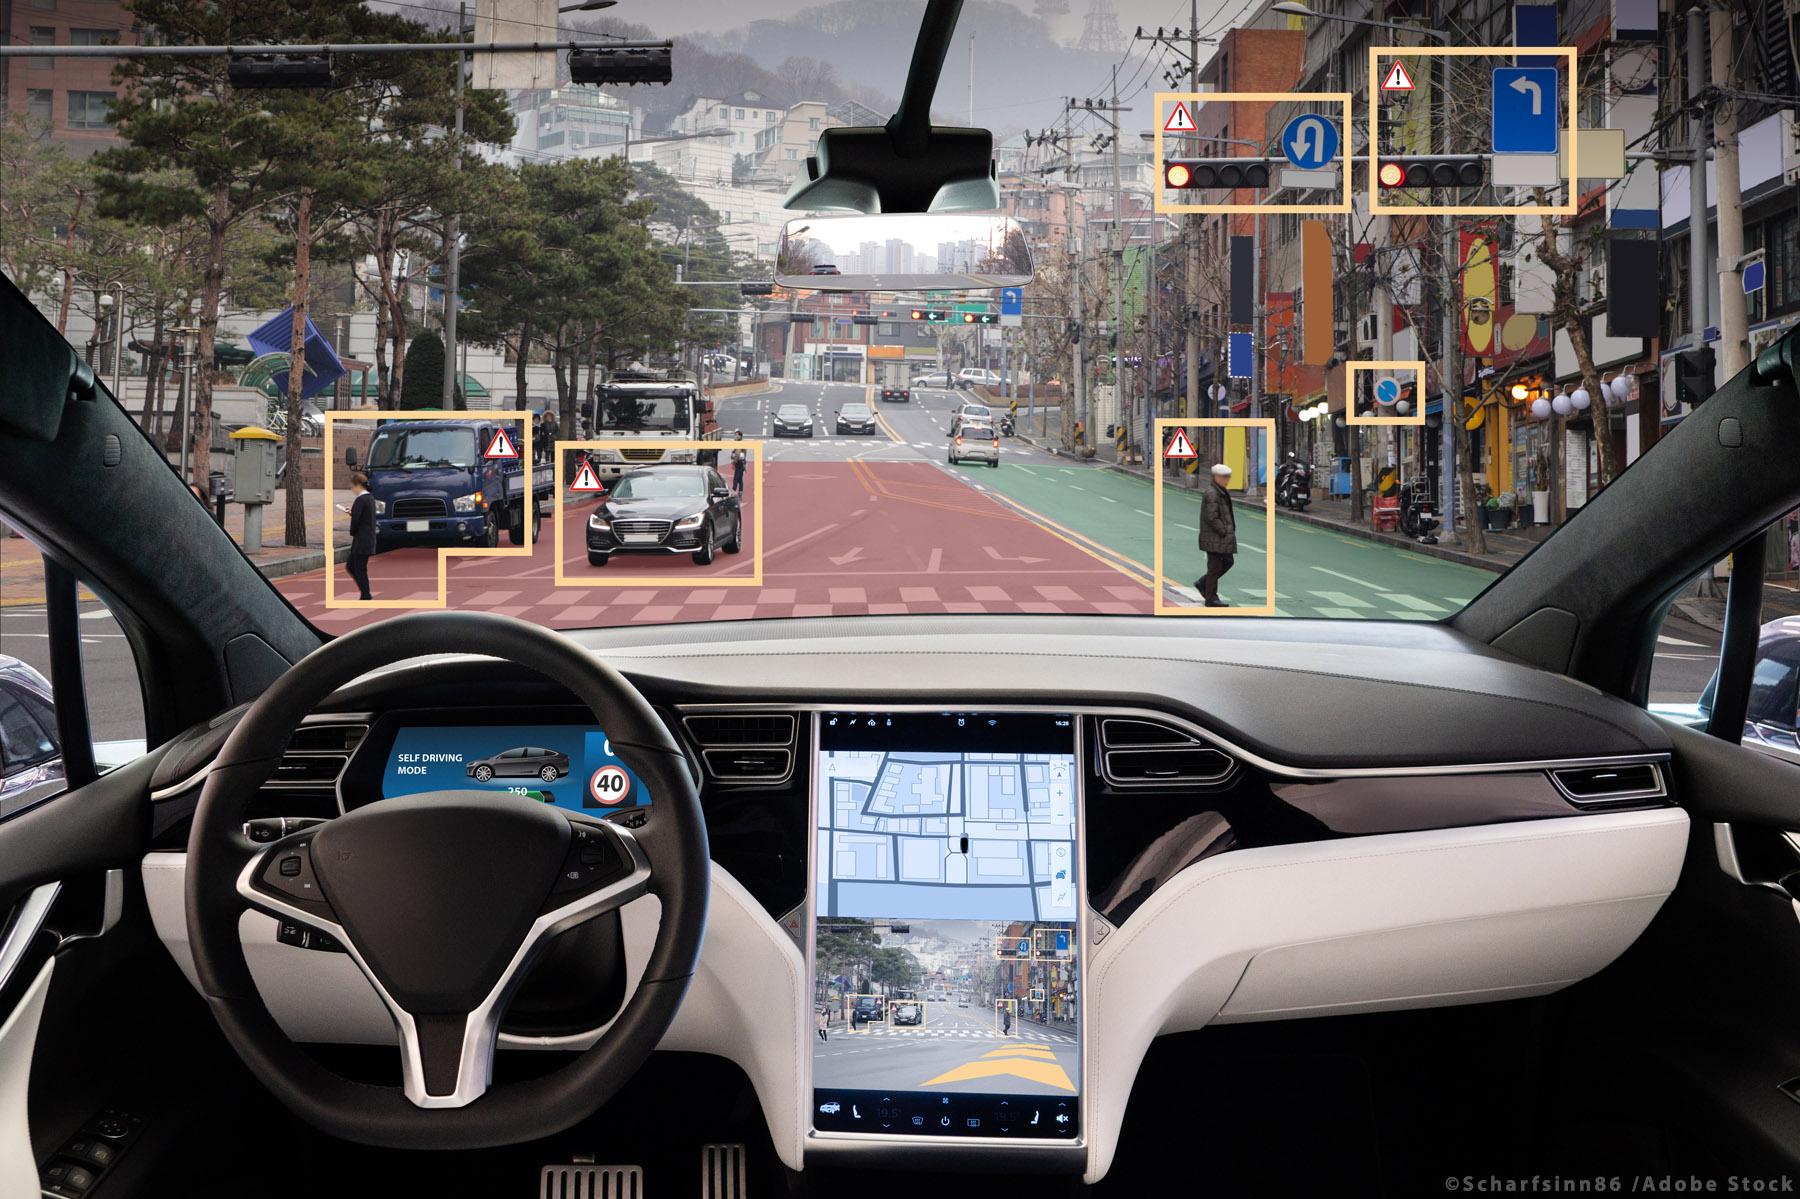 Inteligjenca artificiale, Parlamenti Evropian propozon rregullat e para evropiane